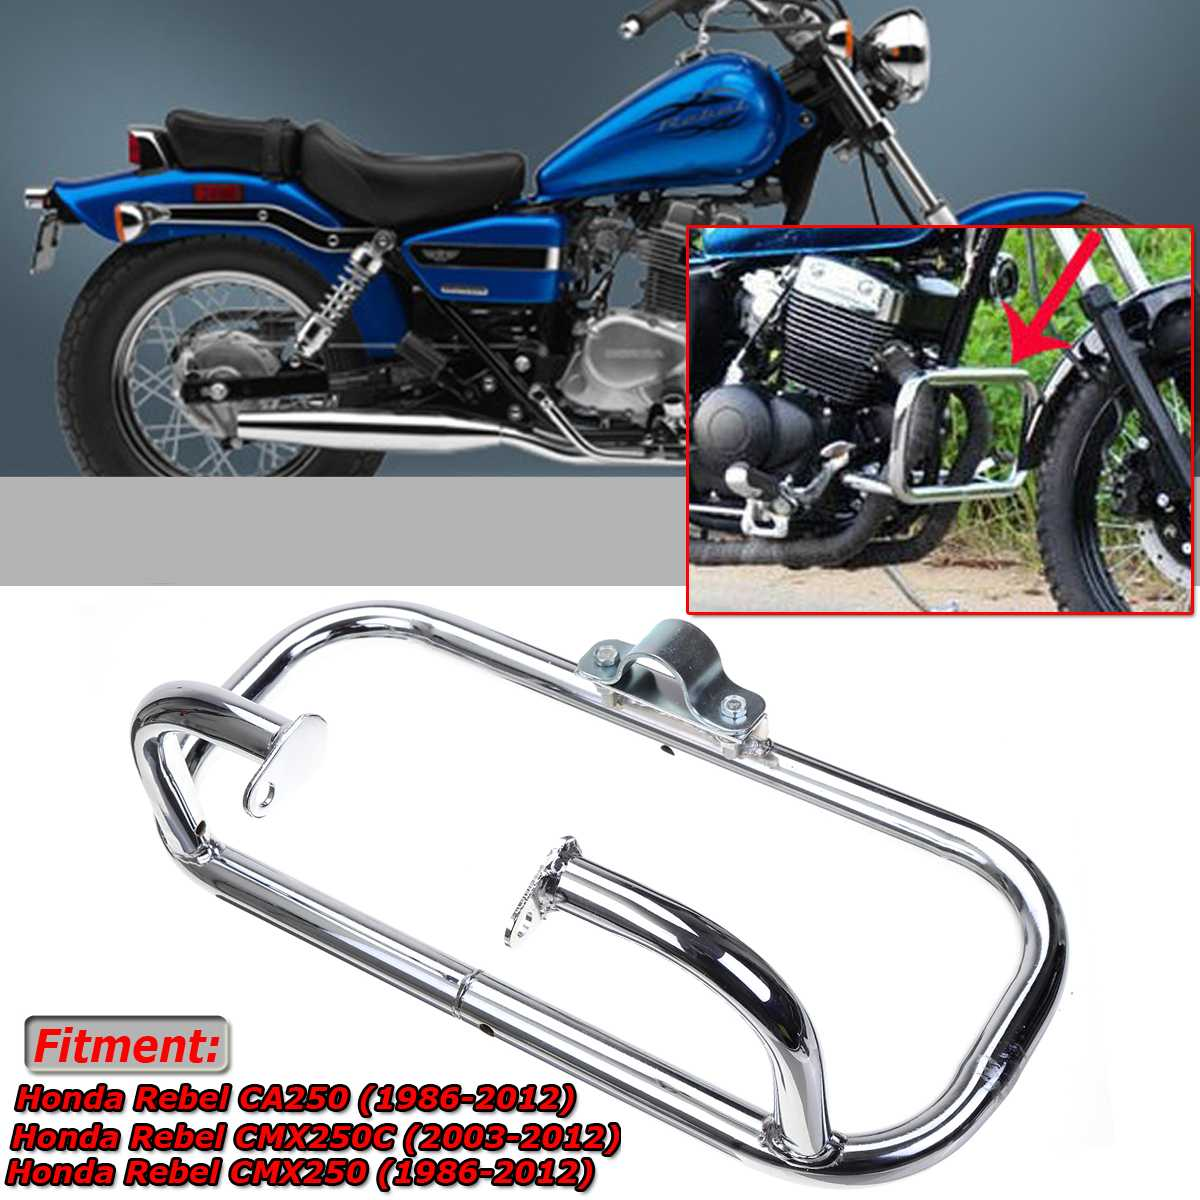 Motorcycle Engine Crash Bar Bumper Guard Fit for Honda Ca250 CMX250 CMX250C